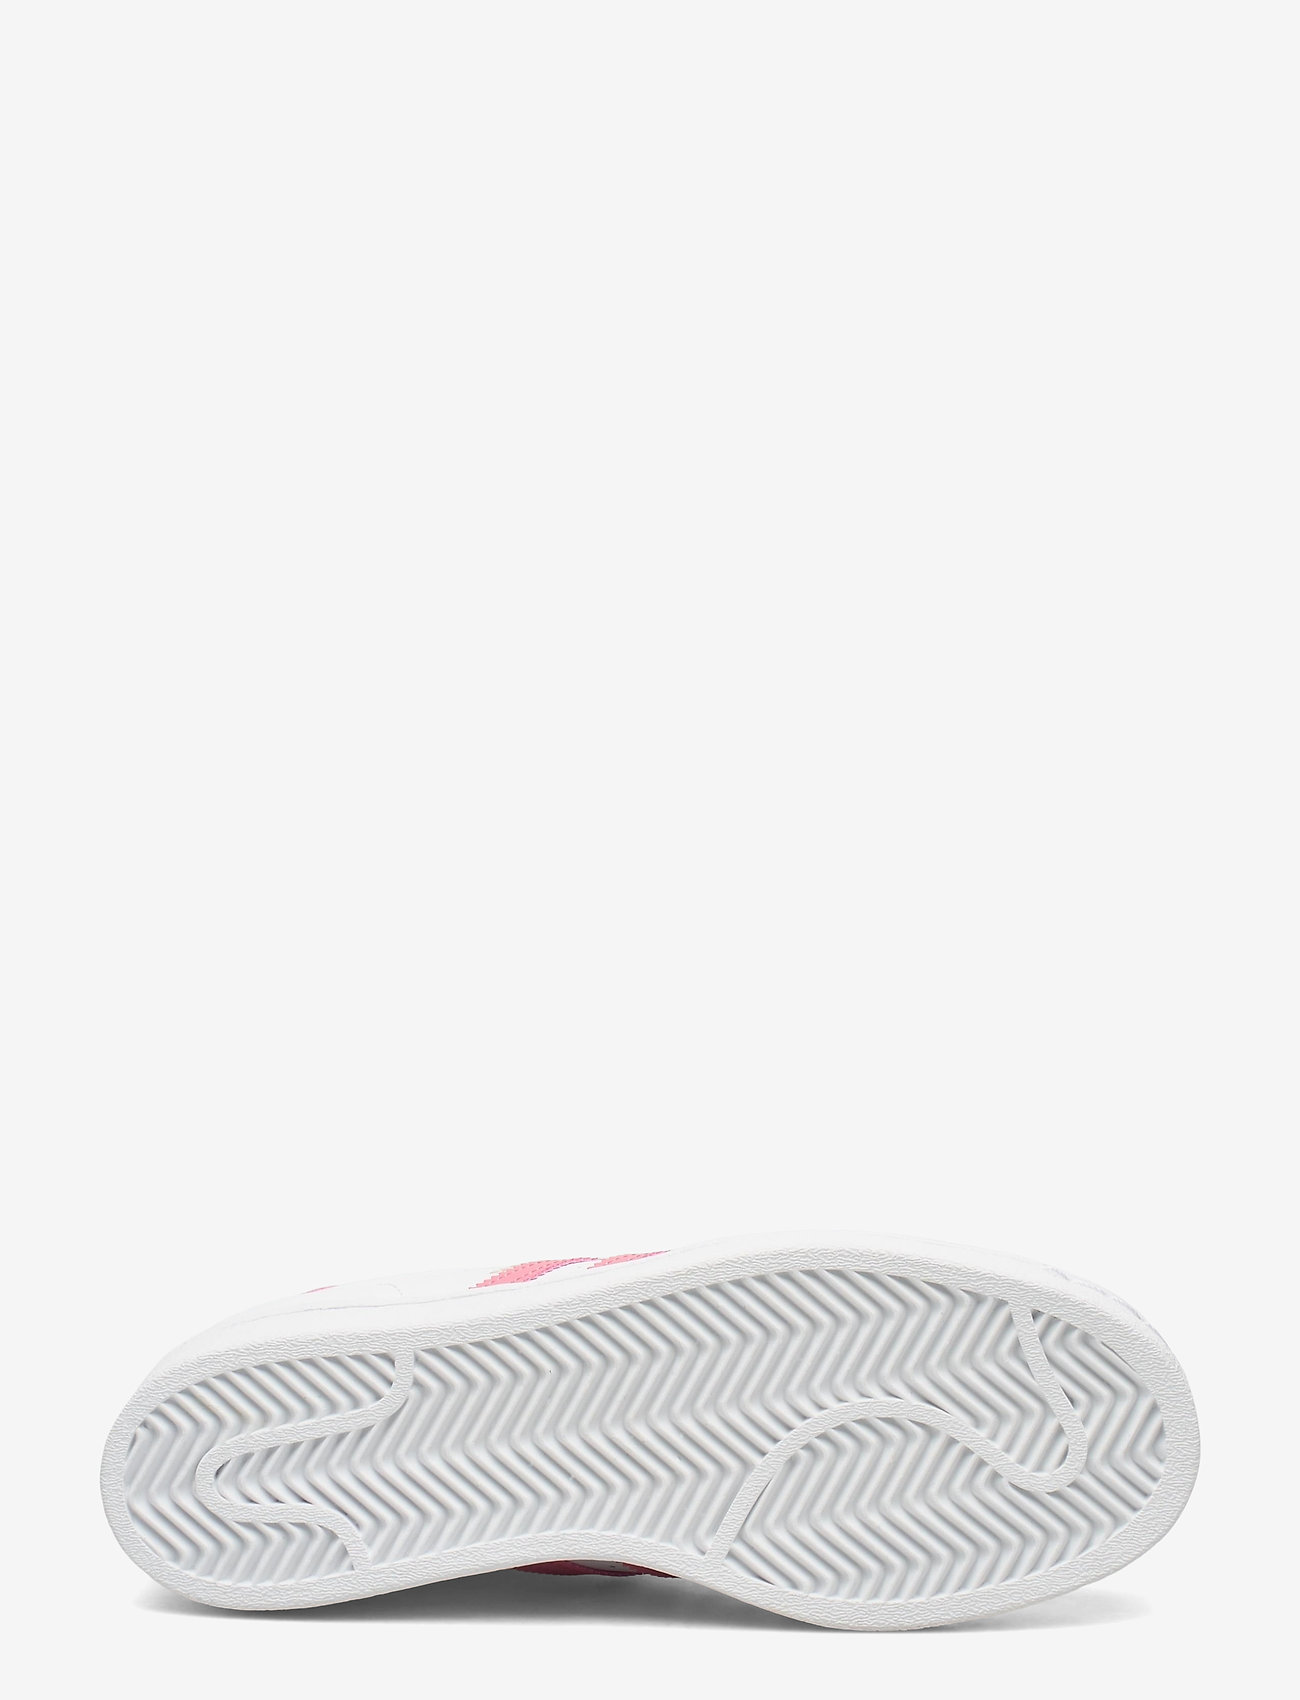 adidas Originals - Superstar W - low top sneakers - ftwwht/bluoxi/goldmt - 4